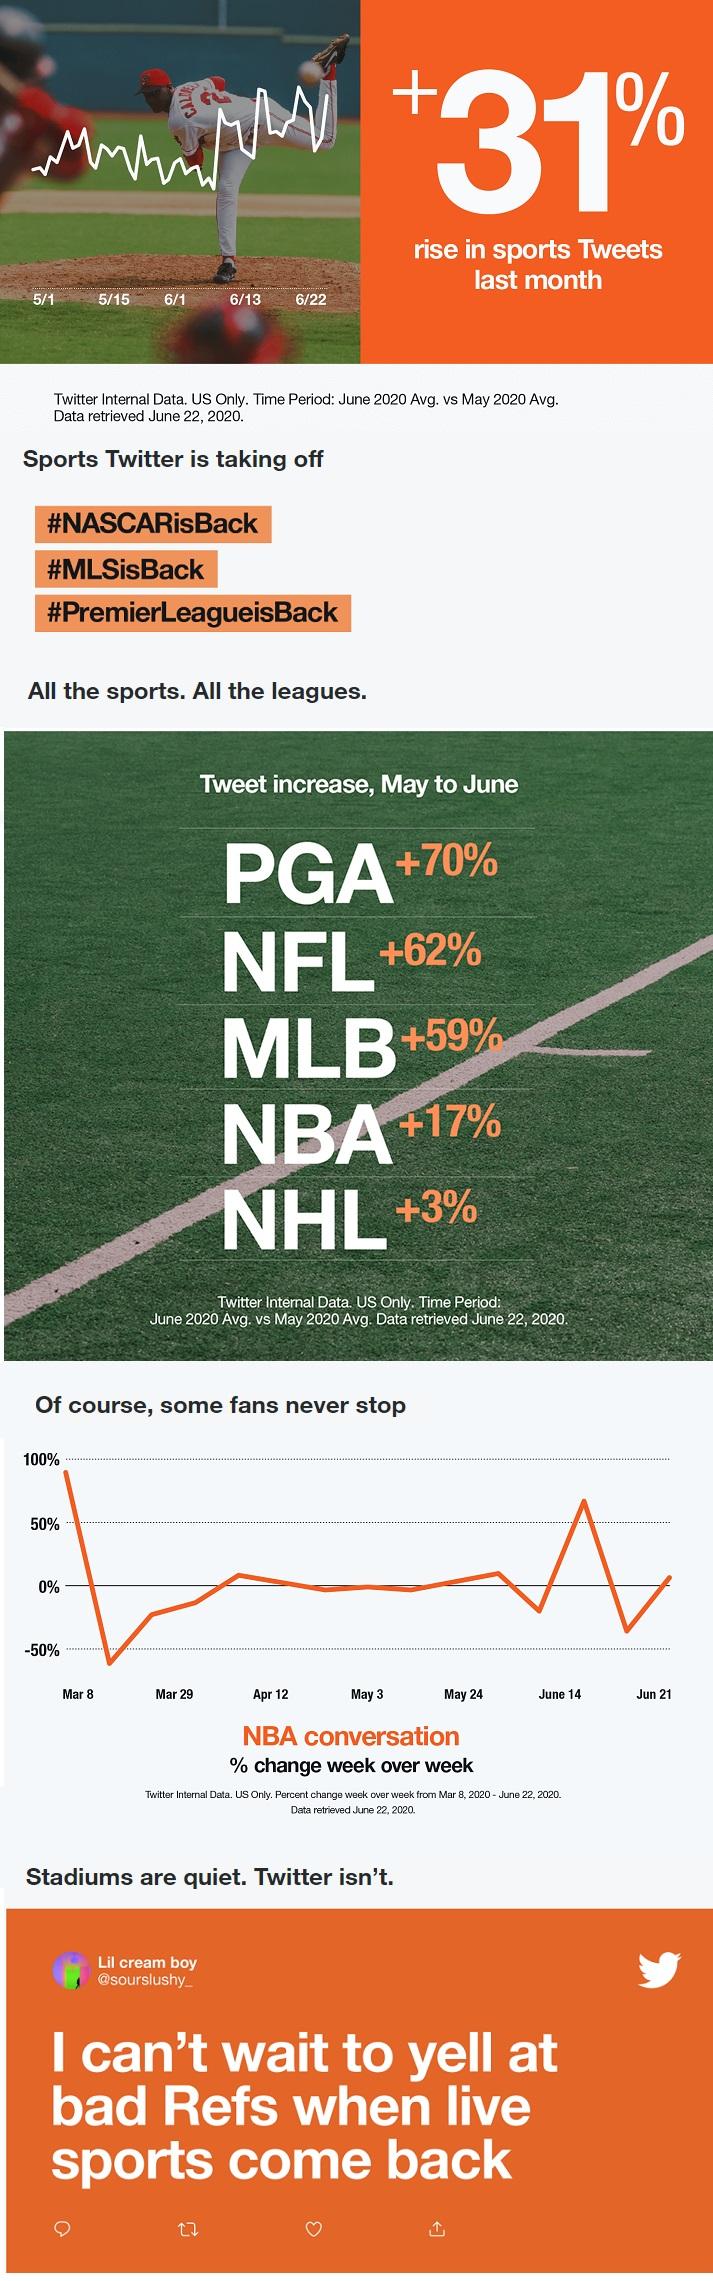 Twitter sports conversation